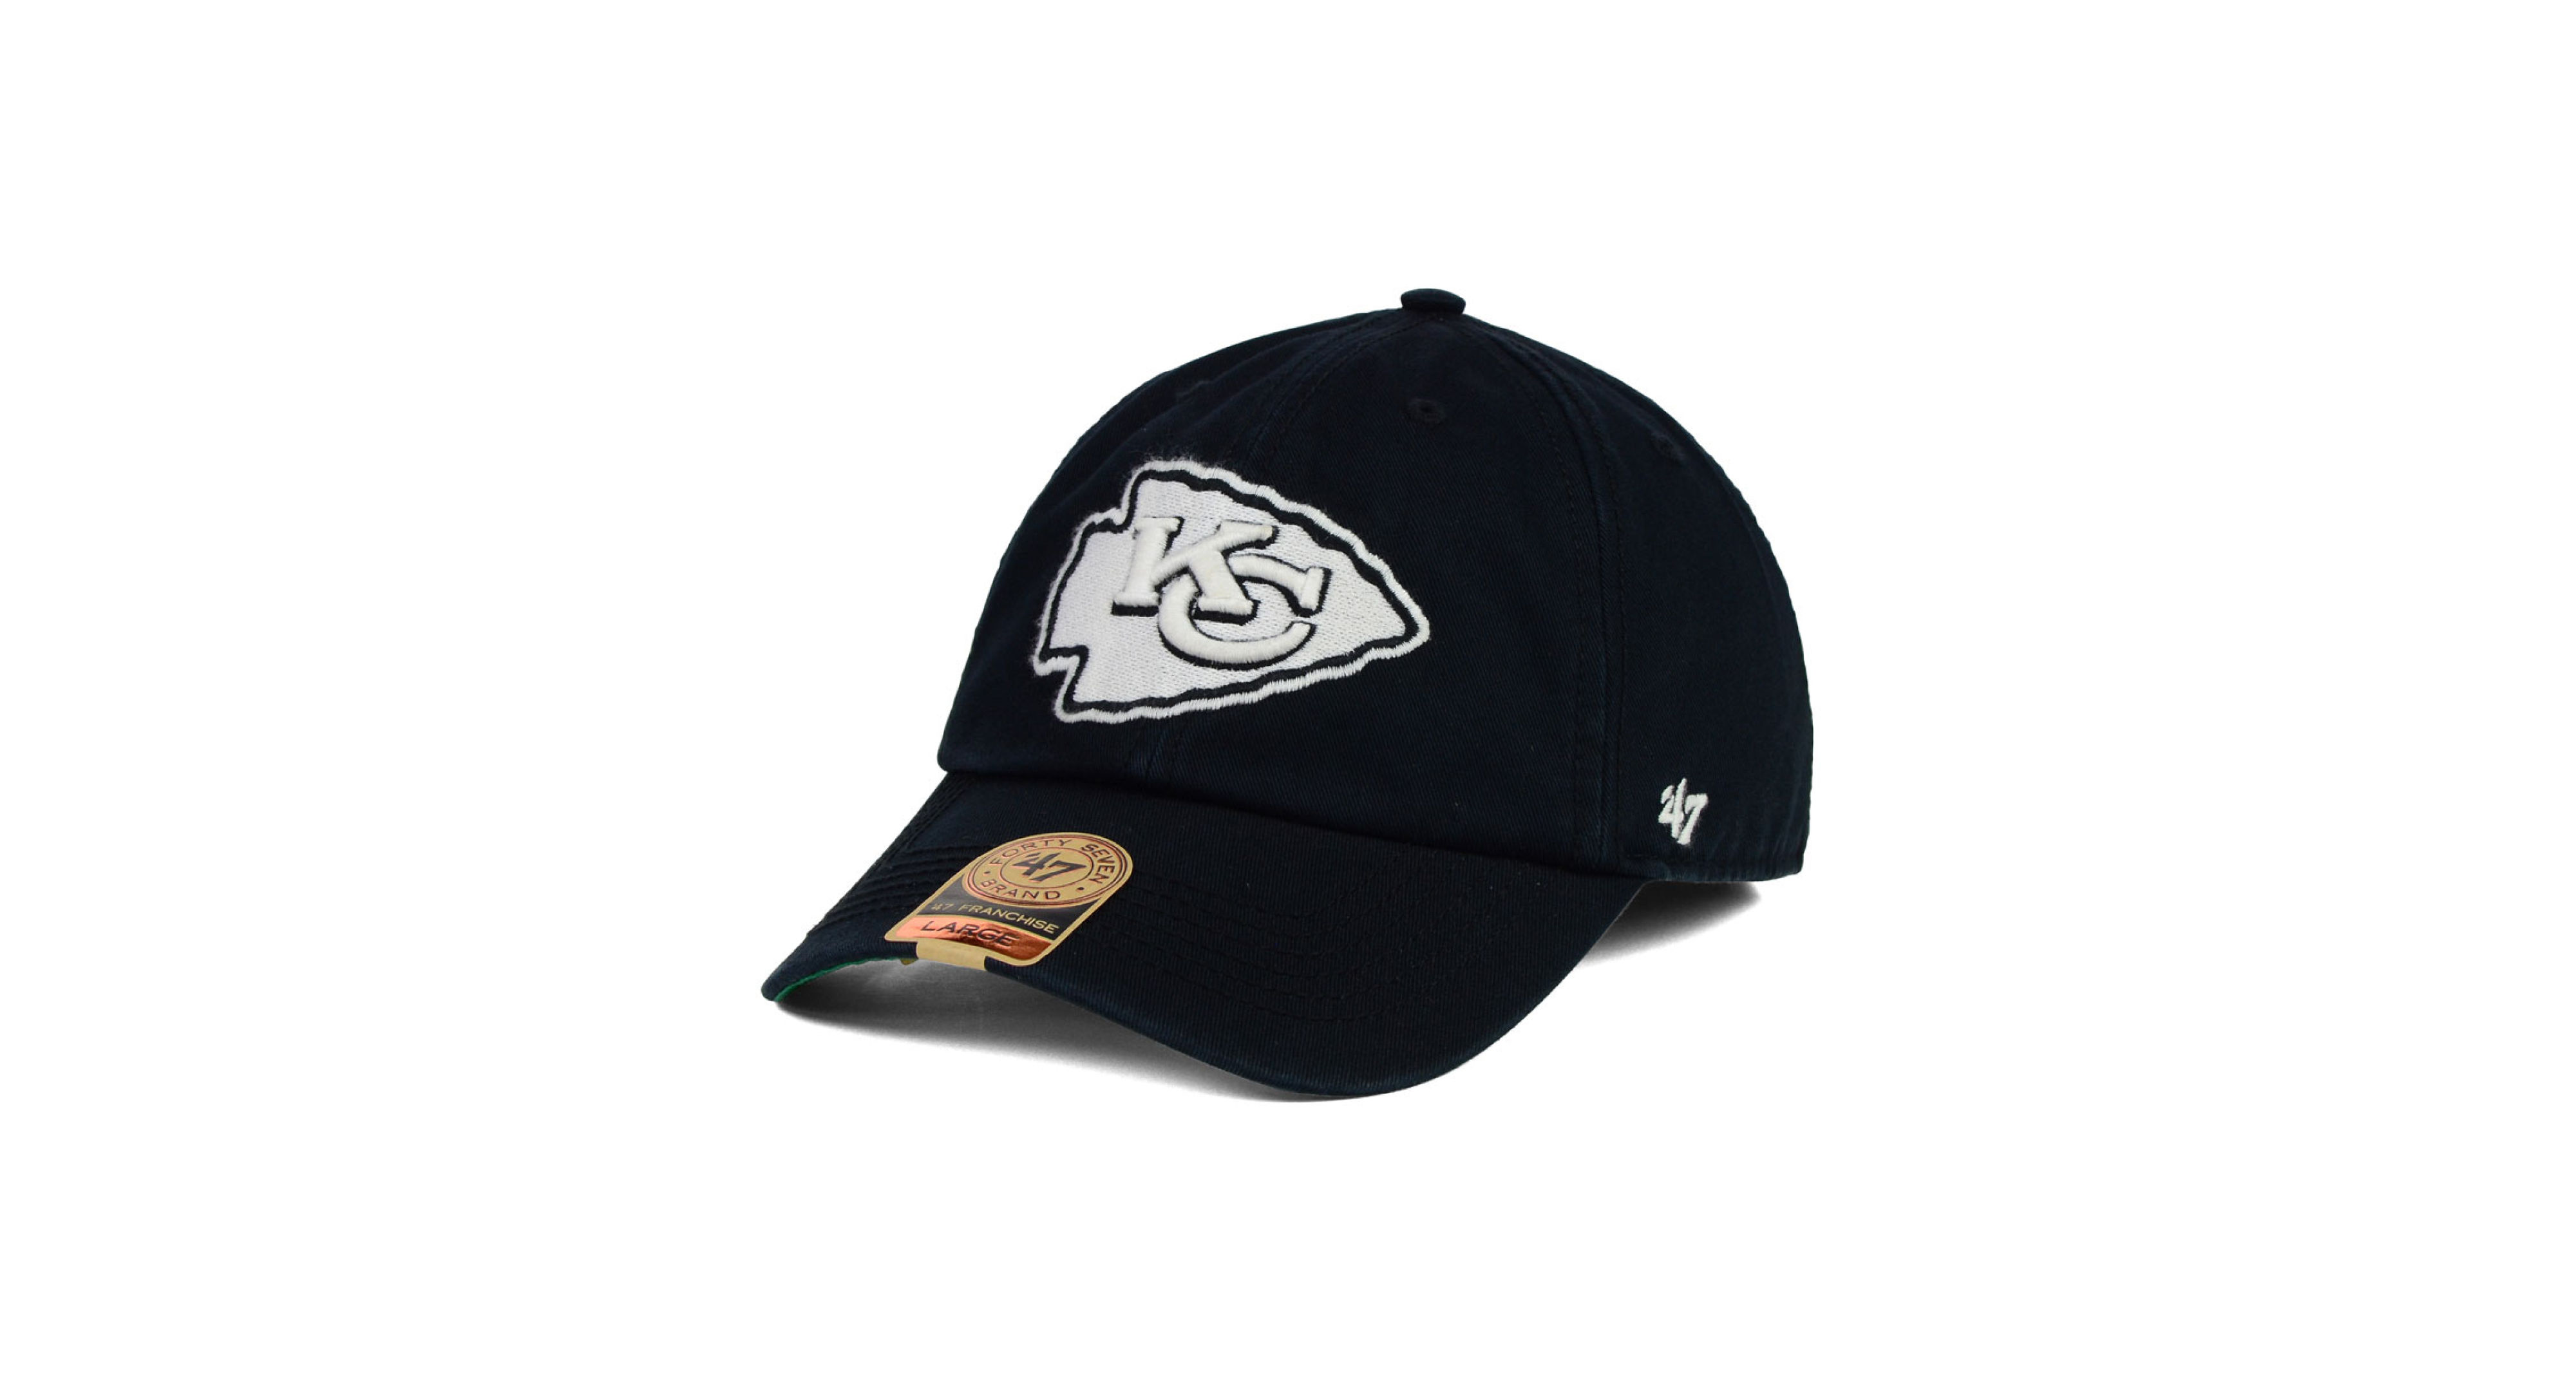 131193f5a  47 Brand Kansas City Chiefs Black White Franchise Cap